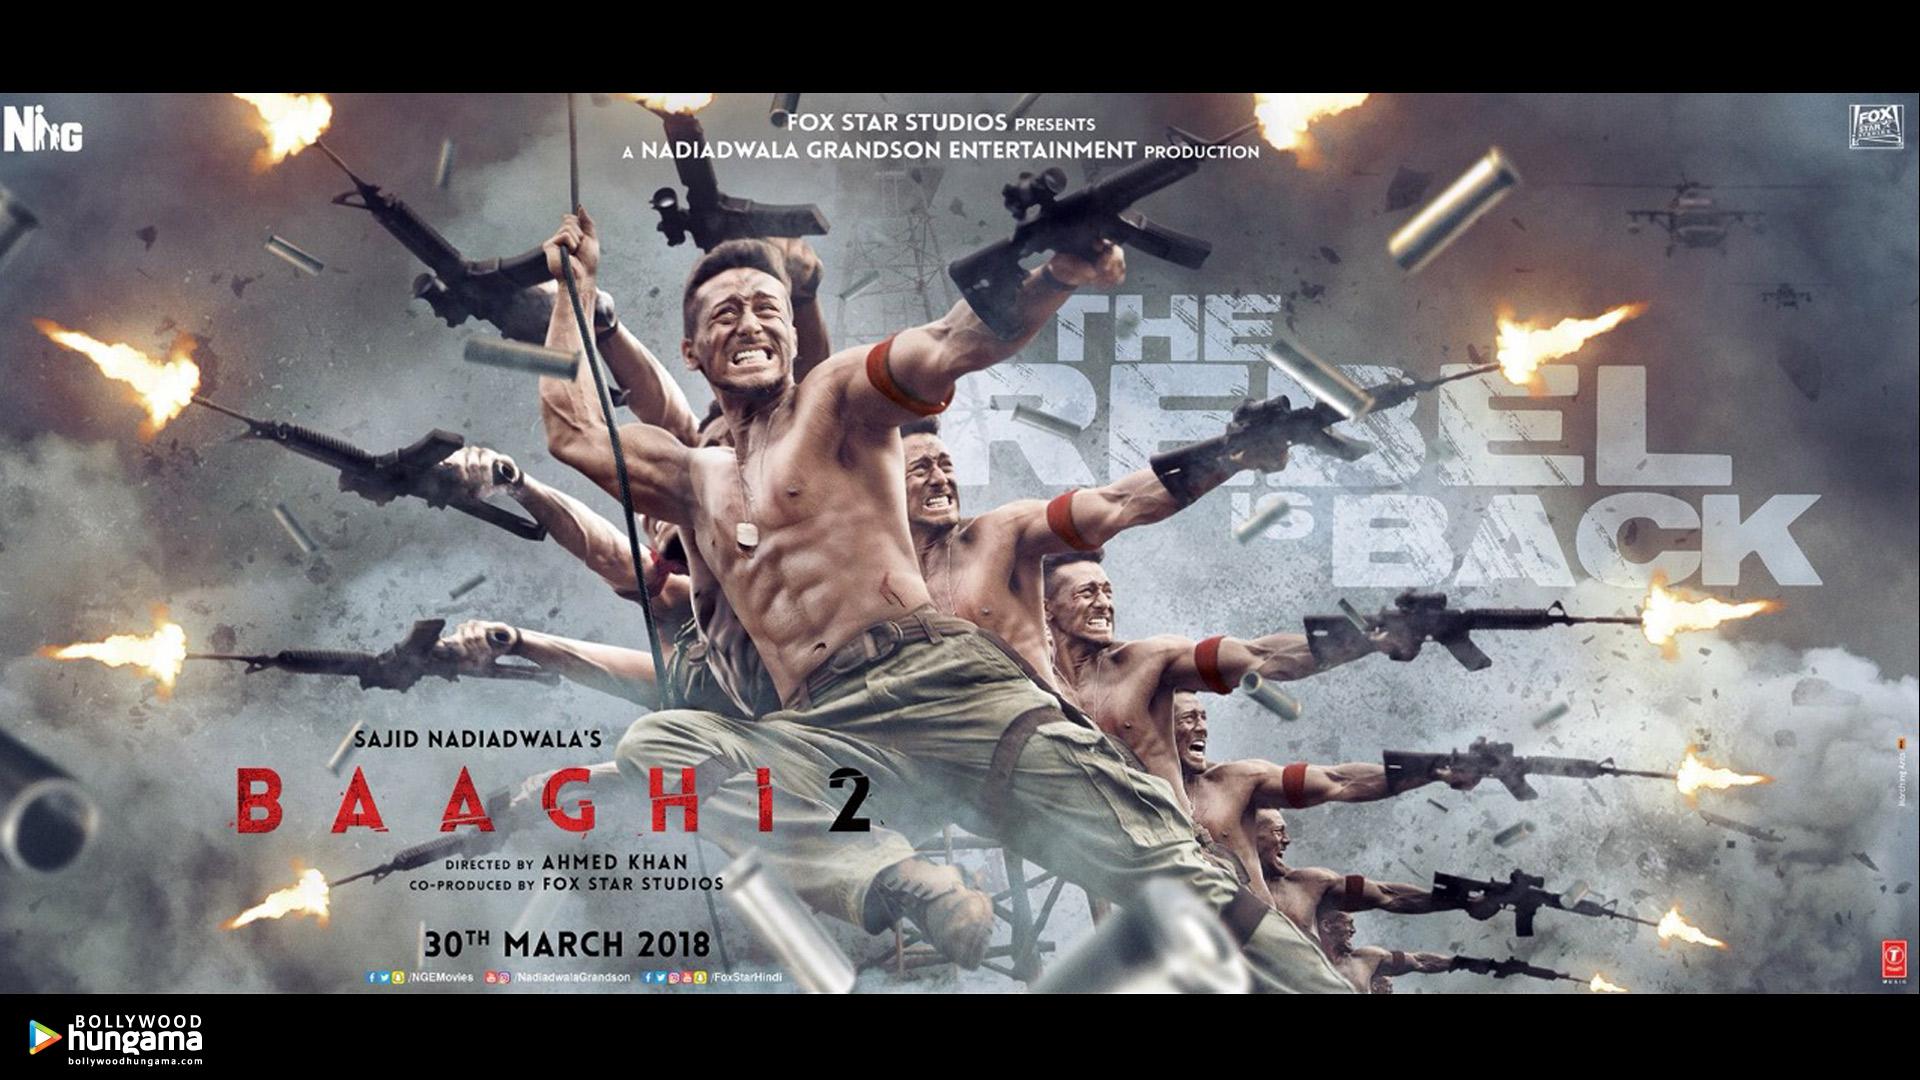 Baaghi 2 2018 Wallpapers Baaghi 2 17 Bollywood Hungama